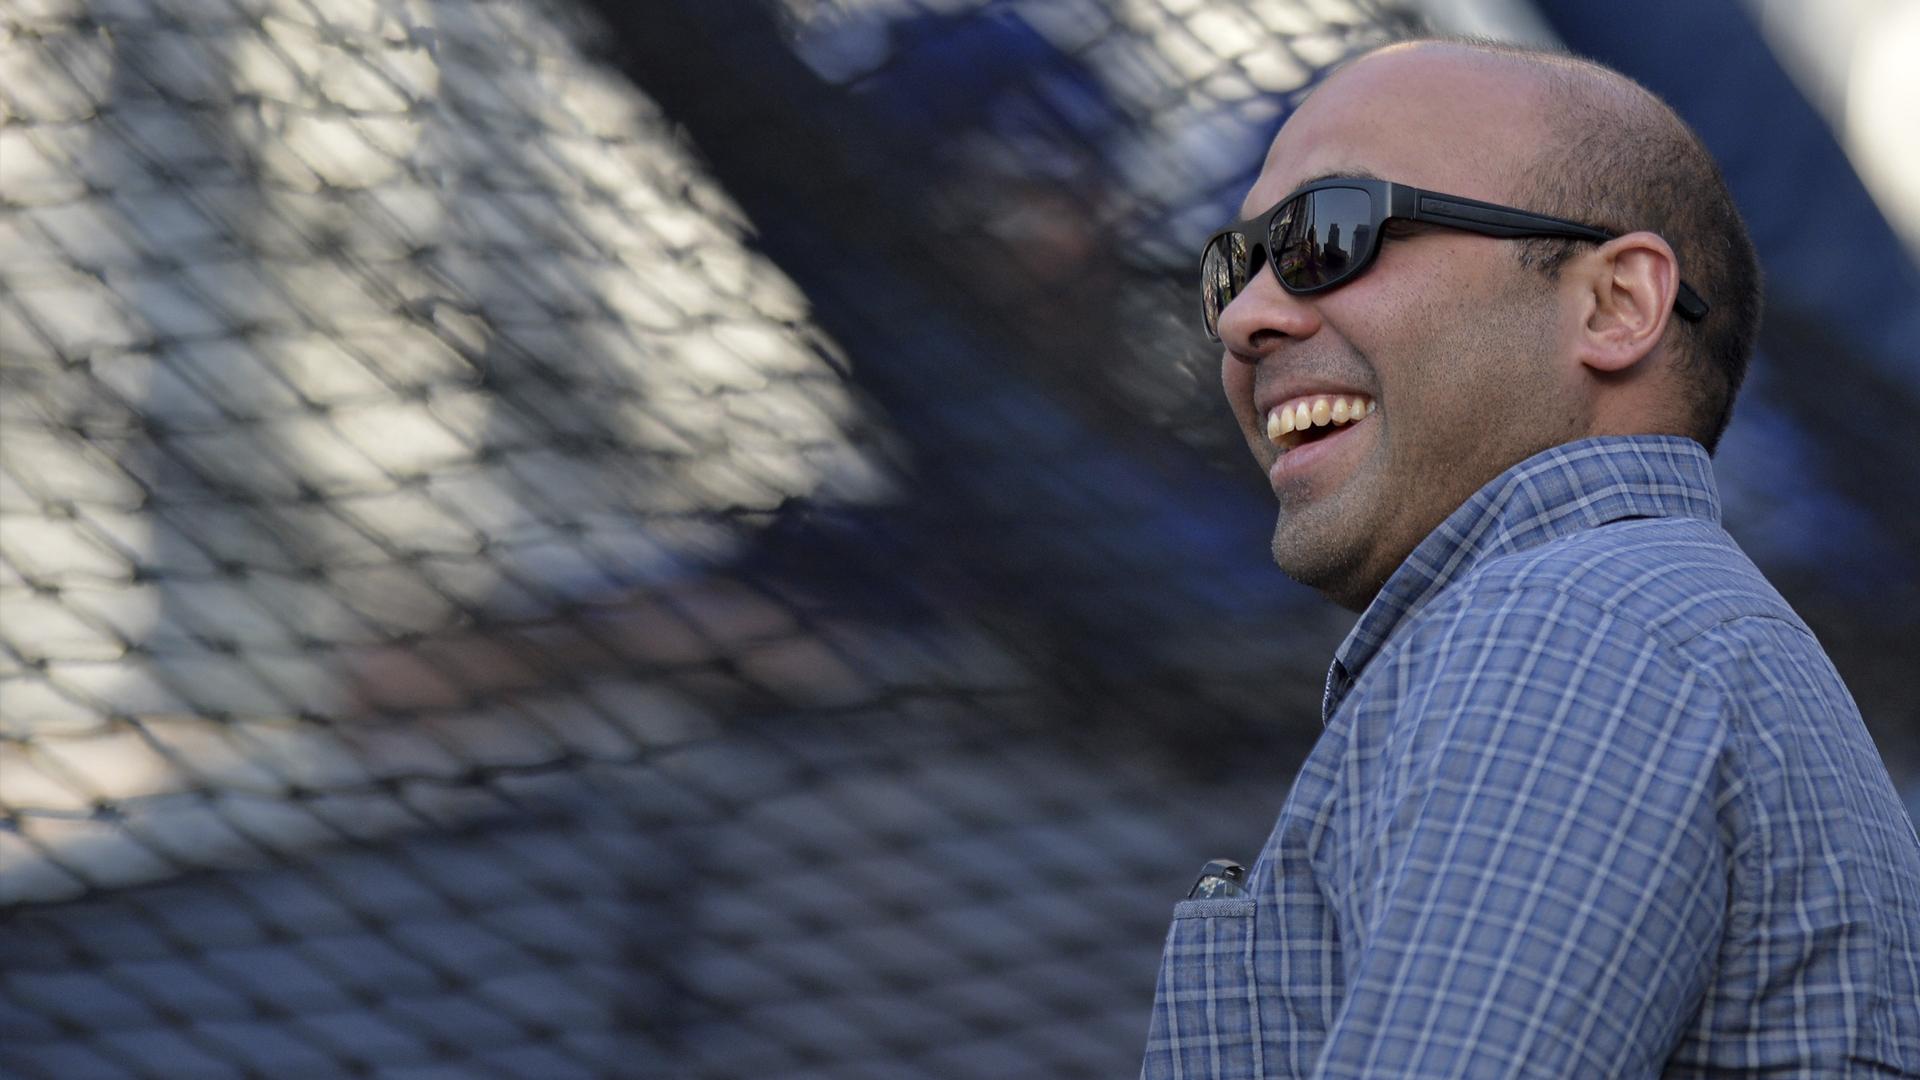 Giants Announce Farhan Zaidi as President of Baseball Operations